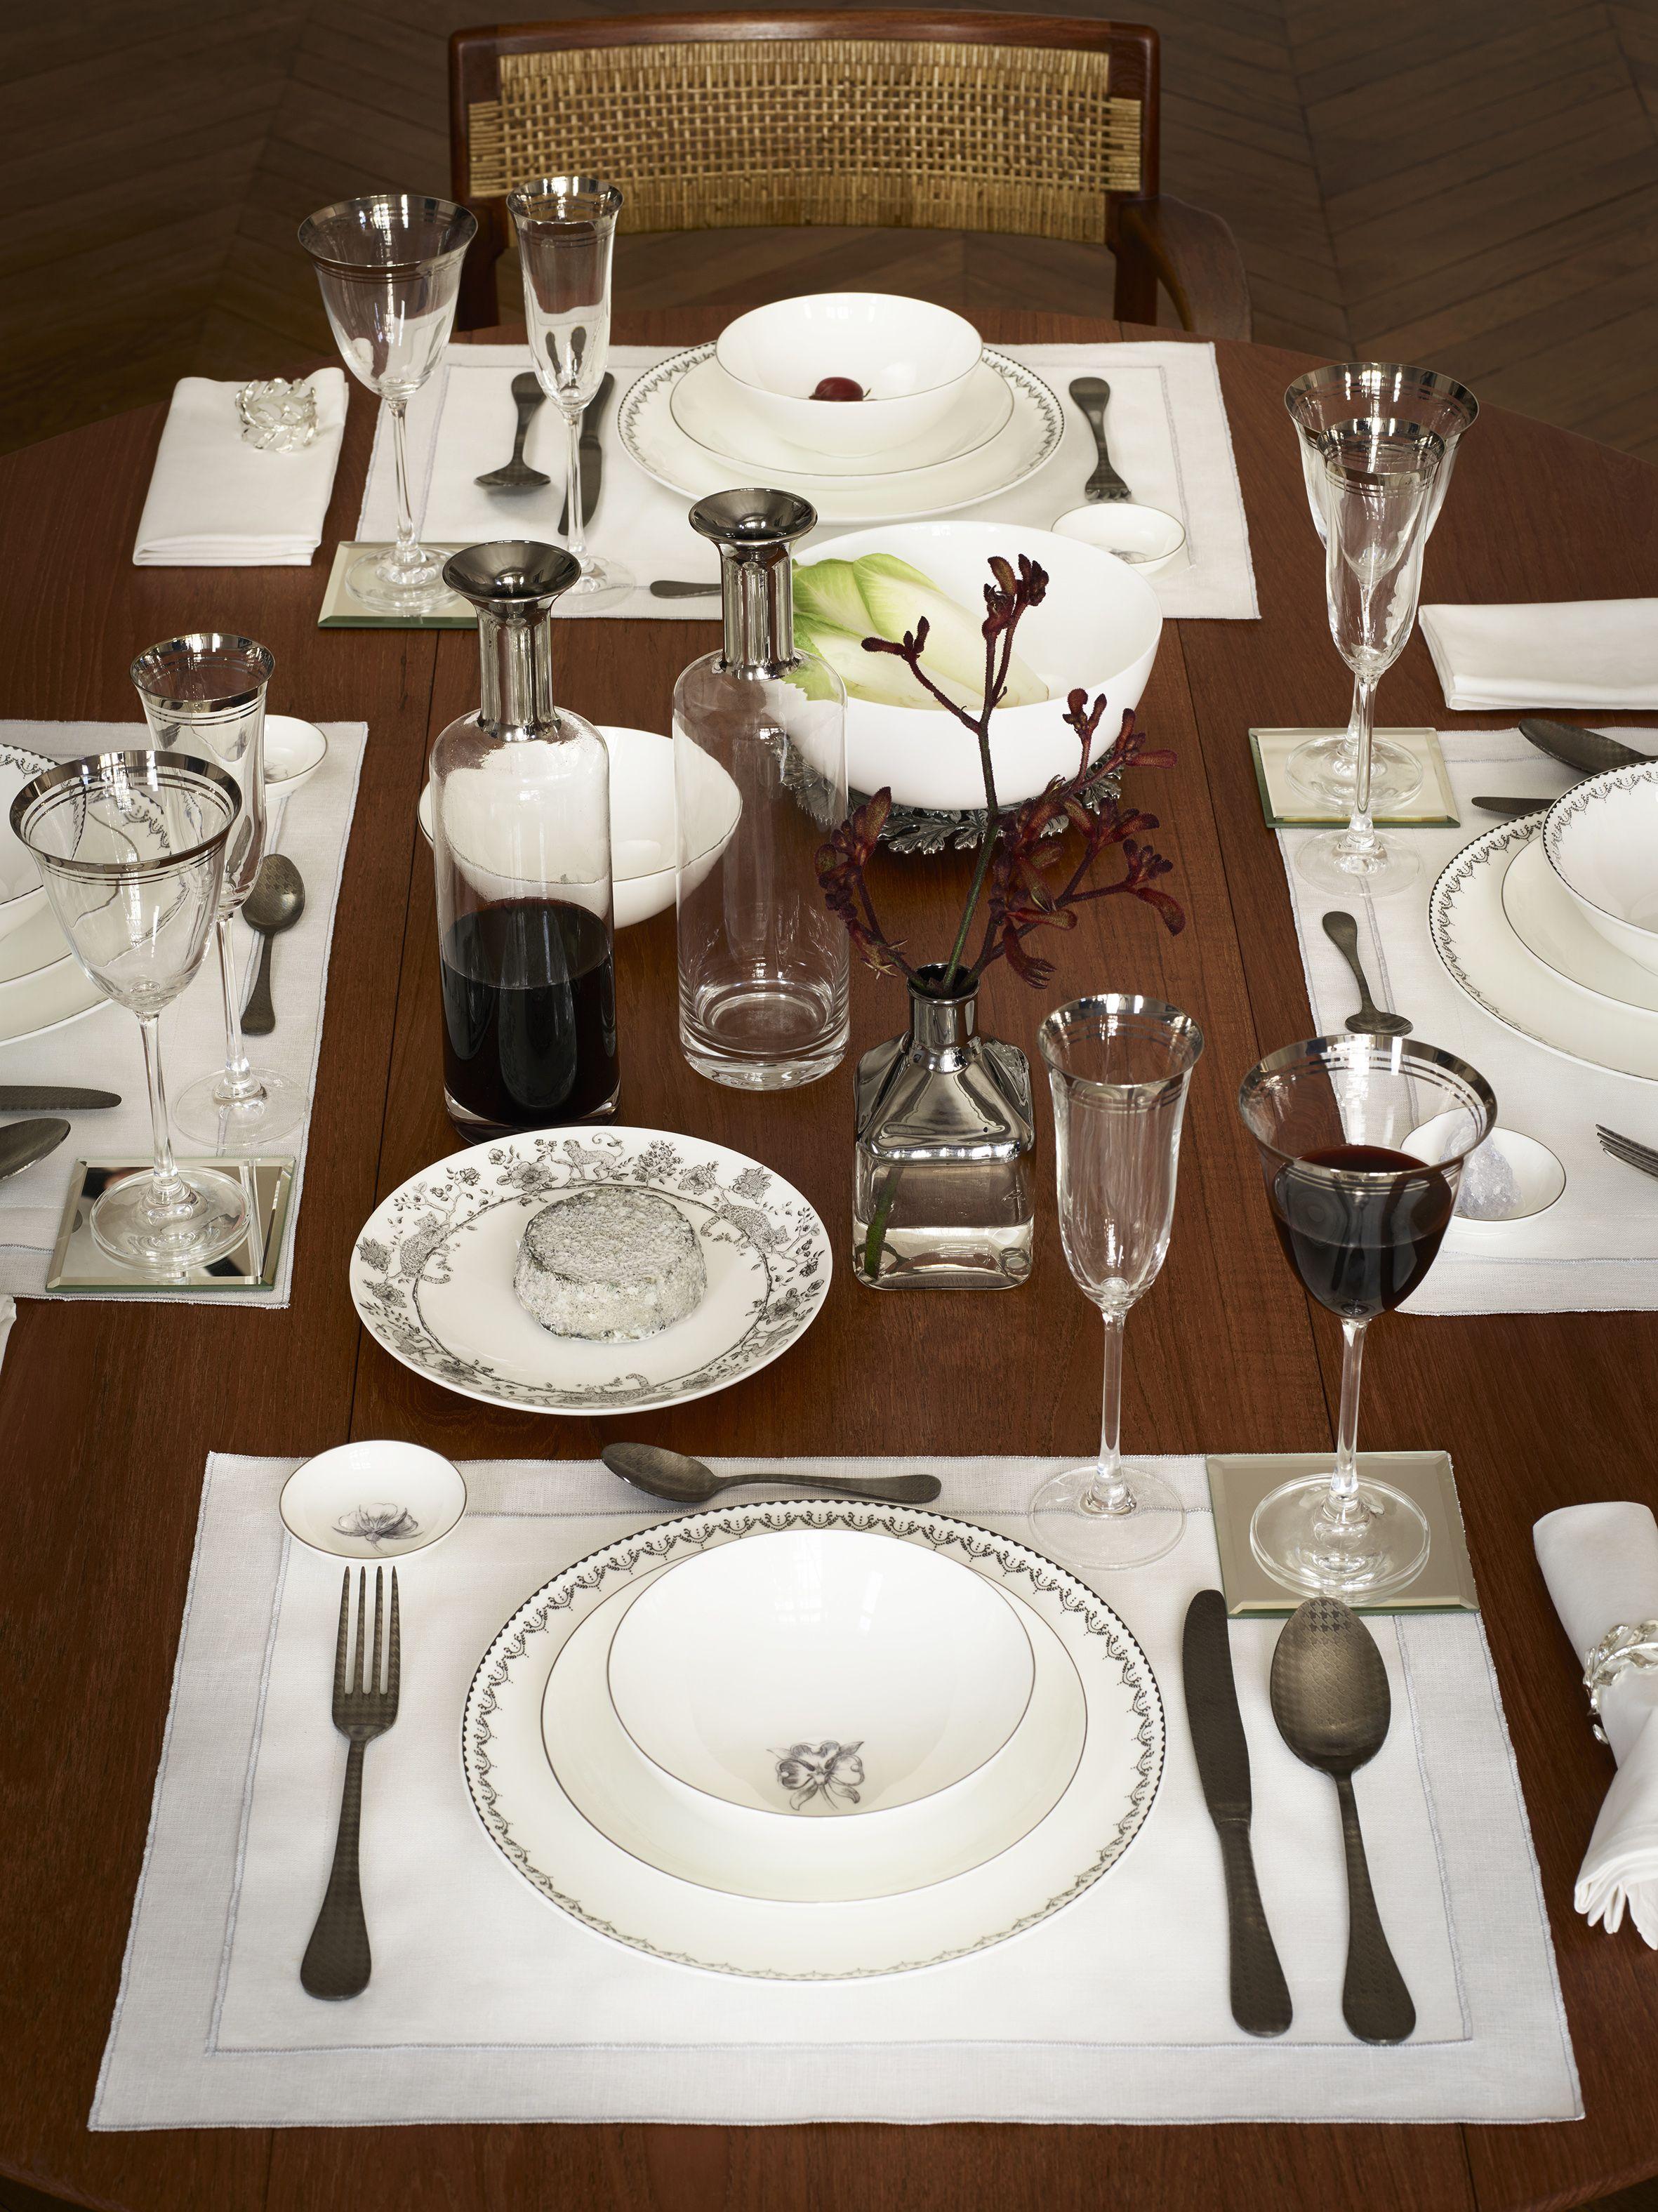 Interiores pinterest servicio de mesa decoraci n hogar y probar - Pinterest decoracion hogar ...